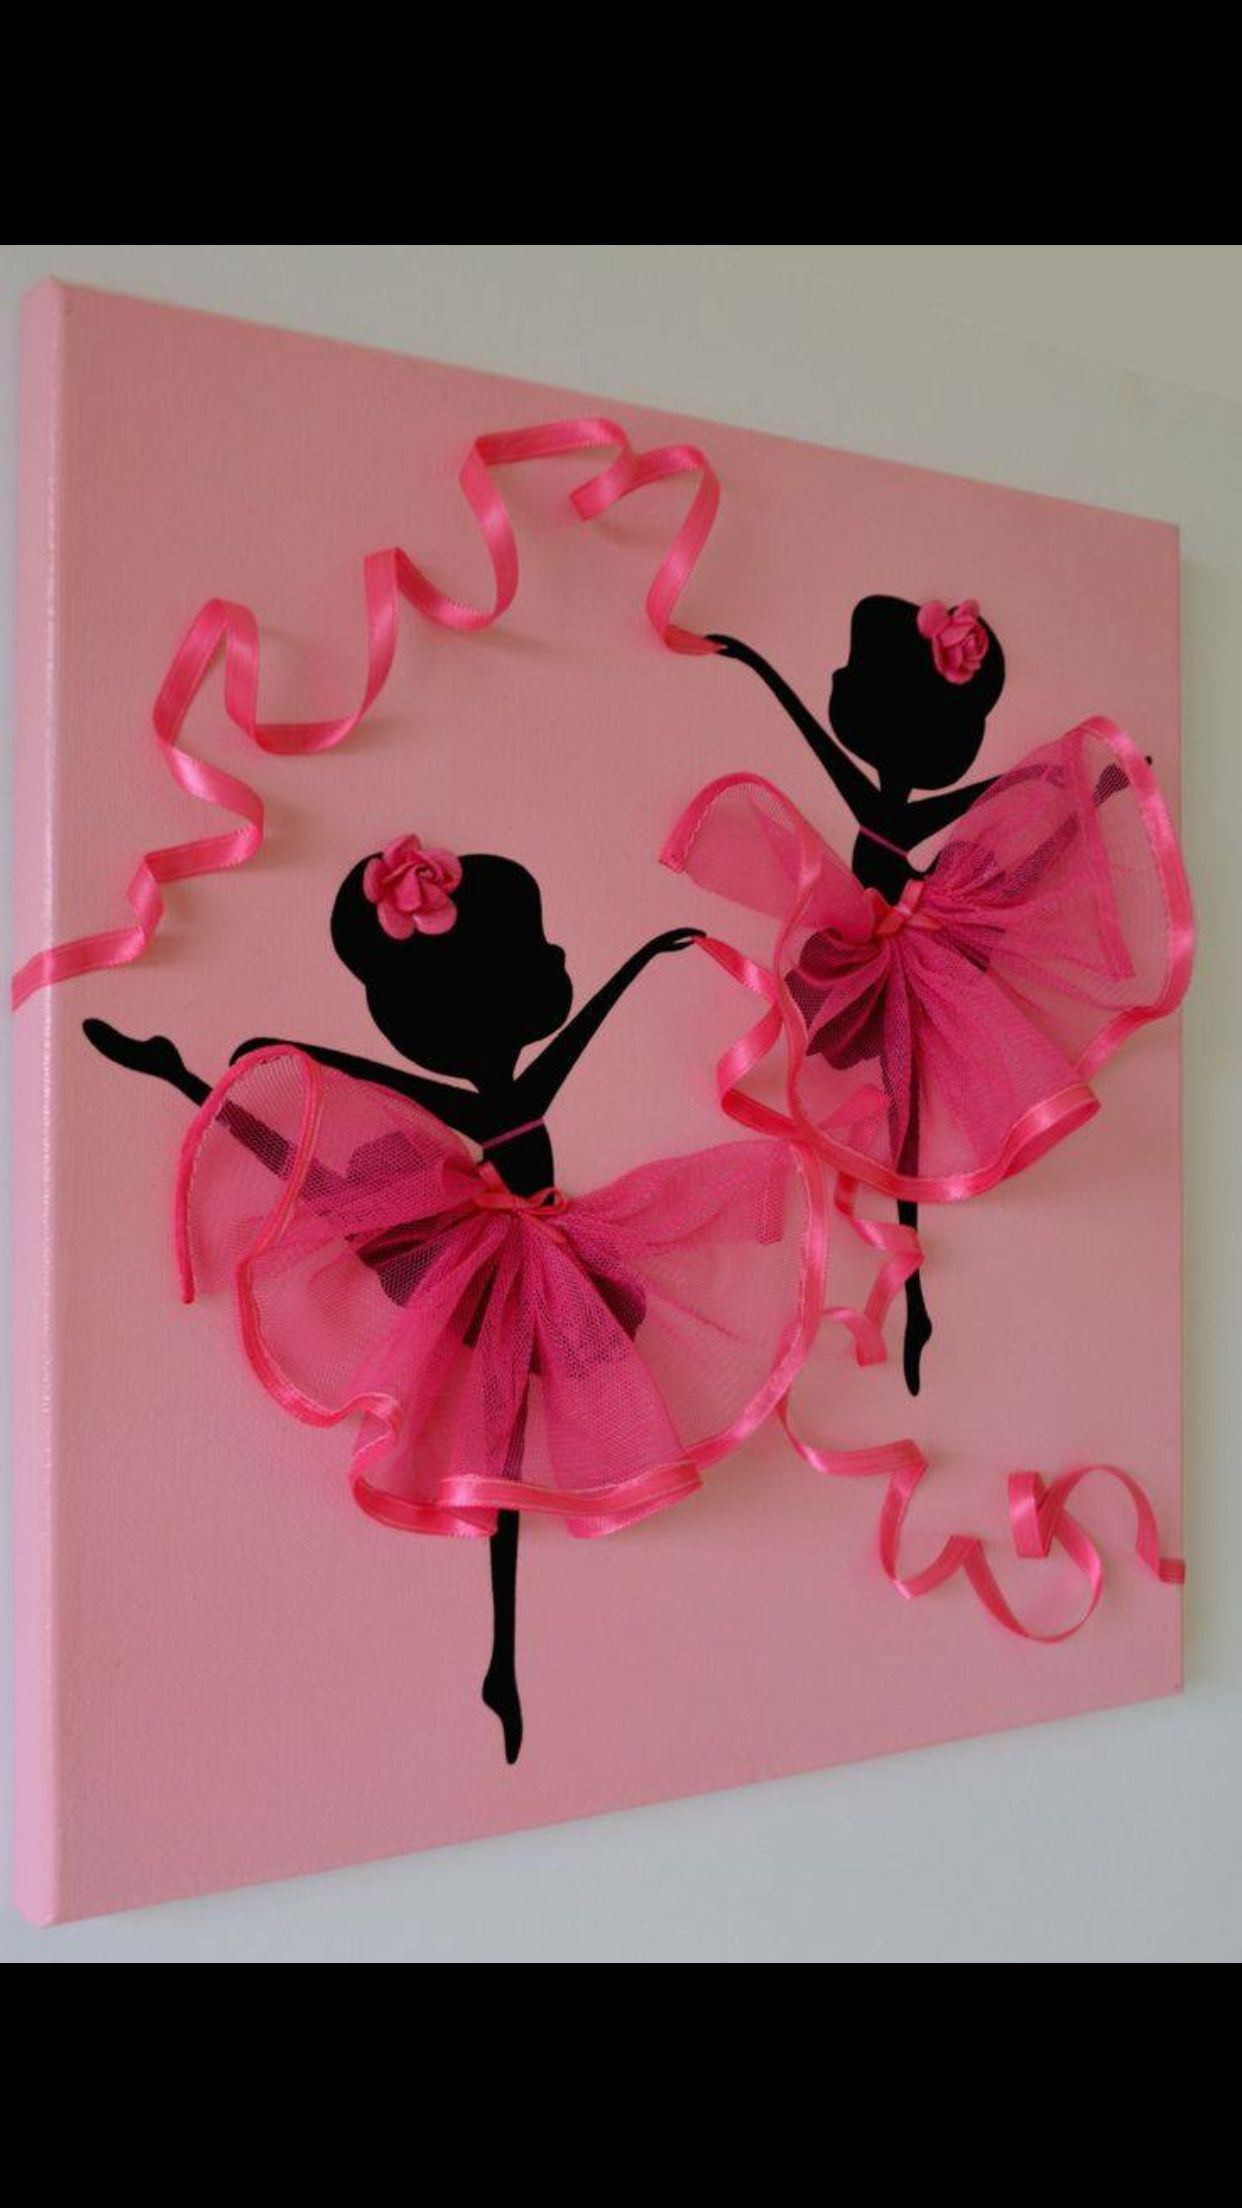 Ballerina tutu canvas wall art wall decor ideas crafts pink